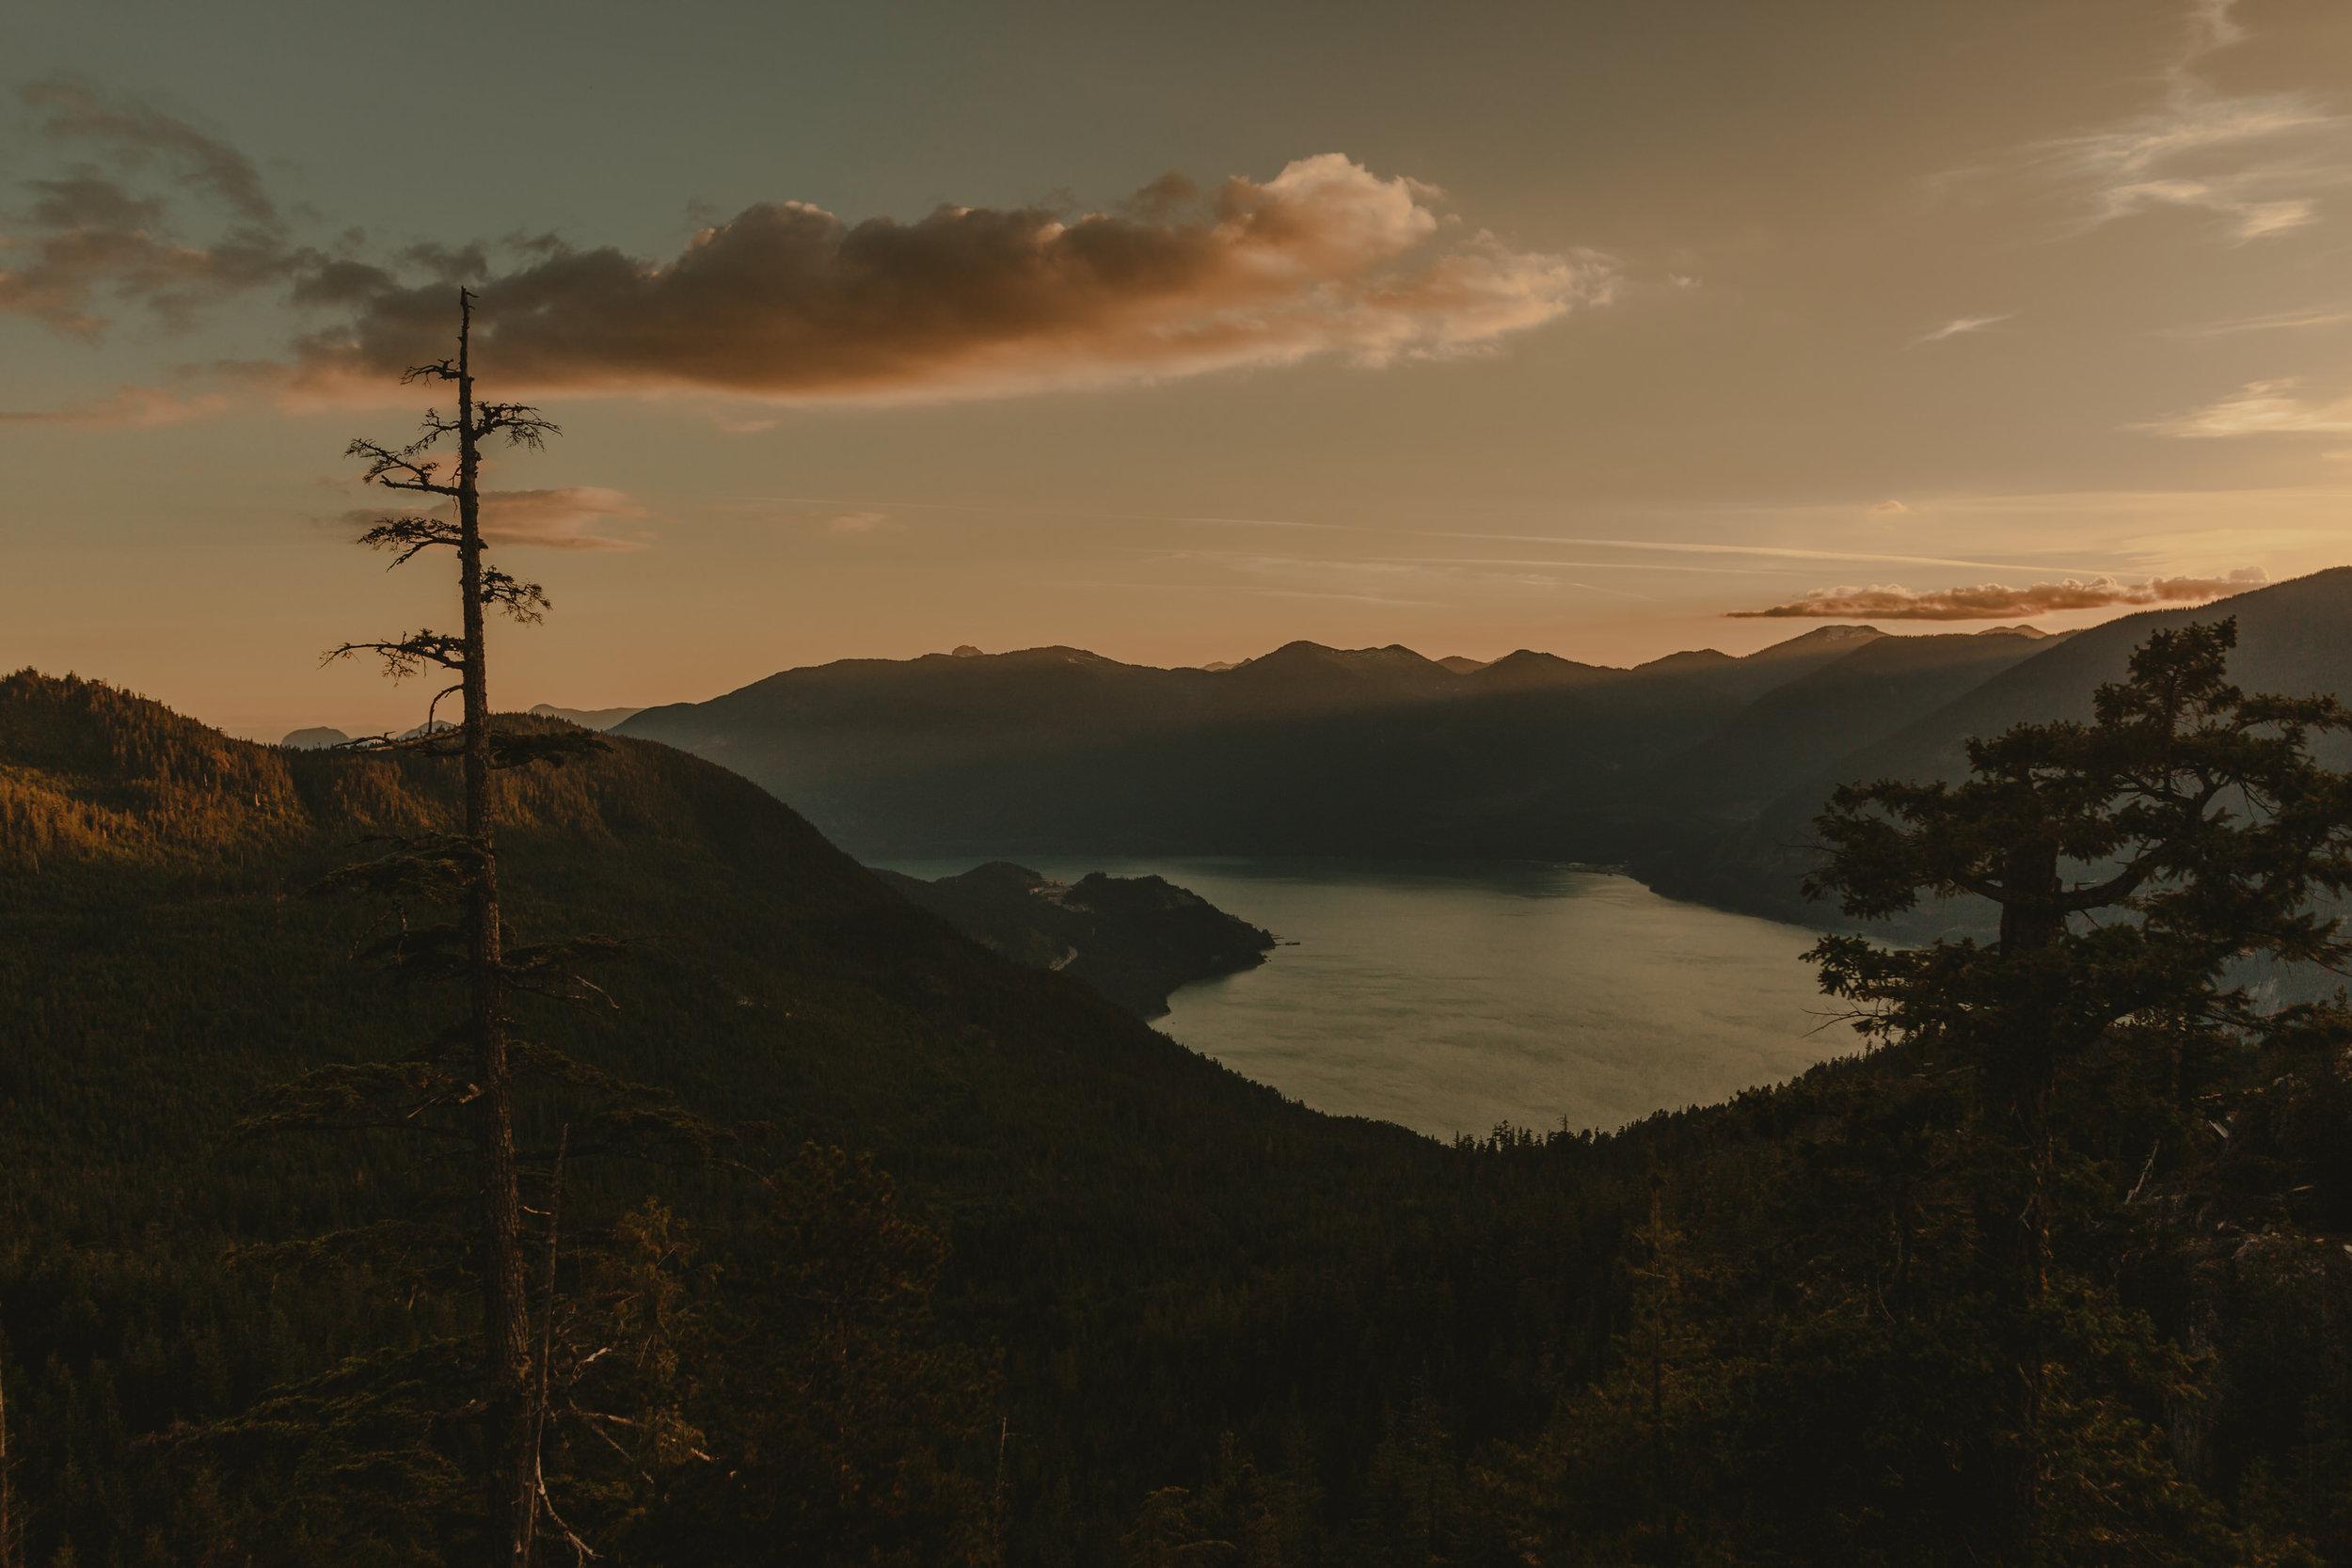 Squamish Wedding Photographer - Sea to Sky Gondola Wedding Photos -  Vancouver Wedding Photographer & Videographer - Sunshine Coast Wedding Photos - Sunshine Coast Wedding Photographer - Jennifer Picard Photography - IMG_5268.jpg